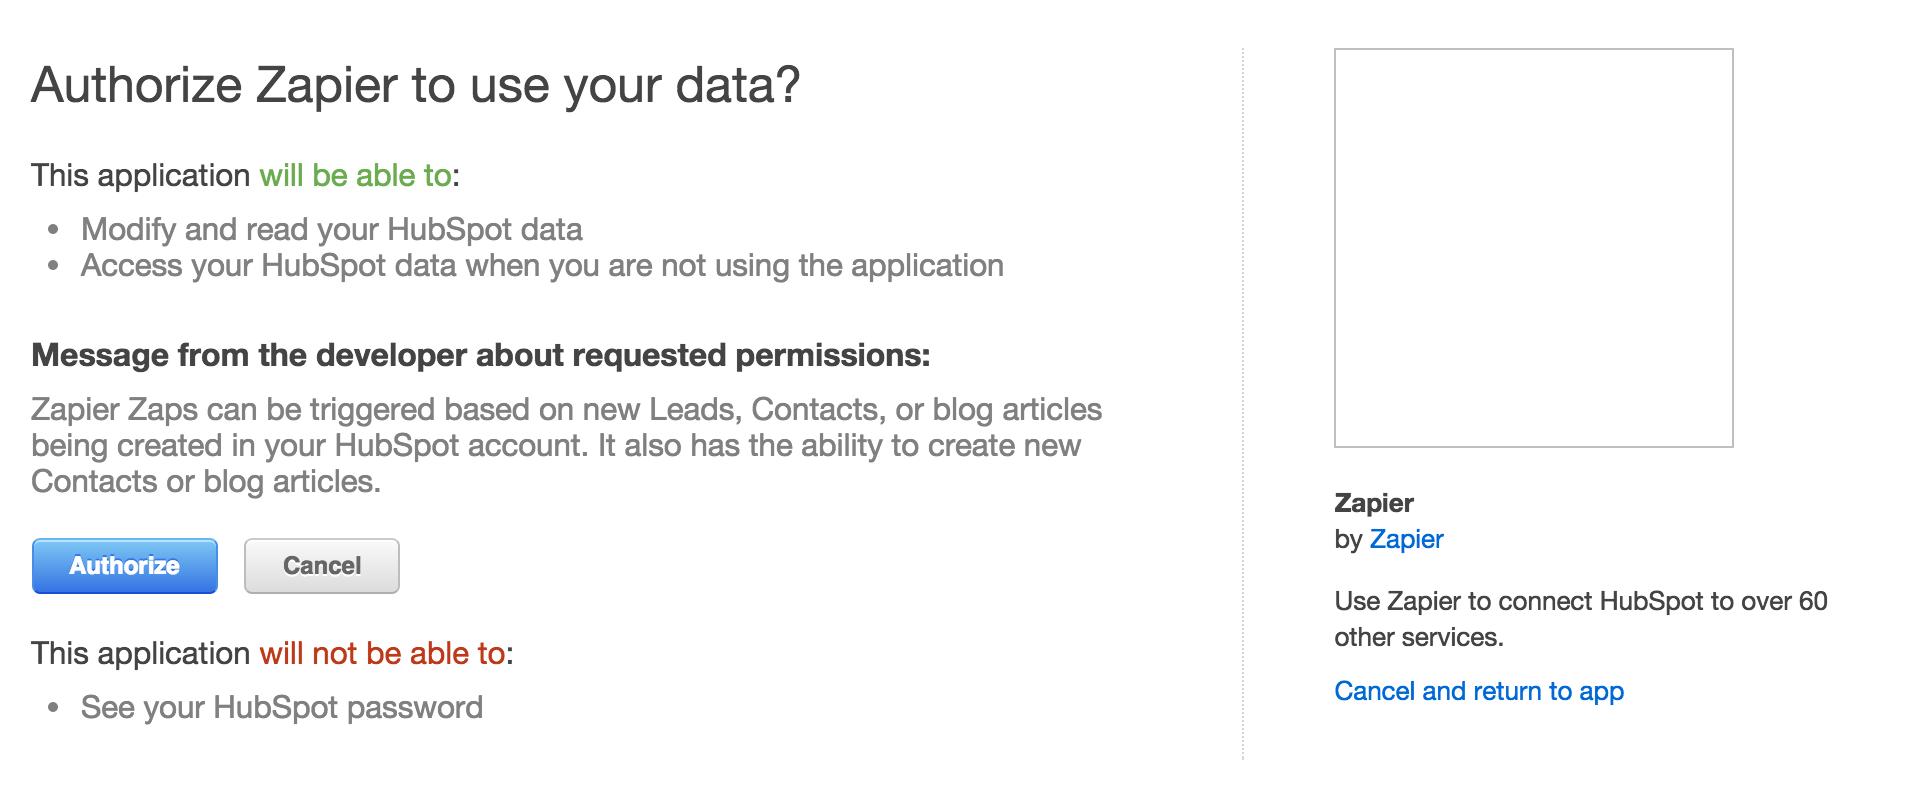 Authorize Zapier for HubSpot.